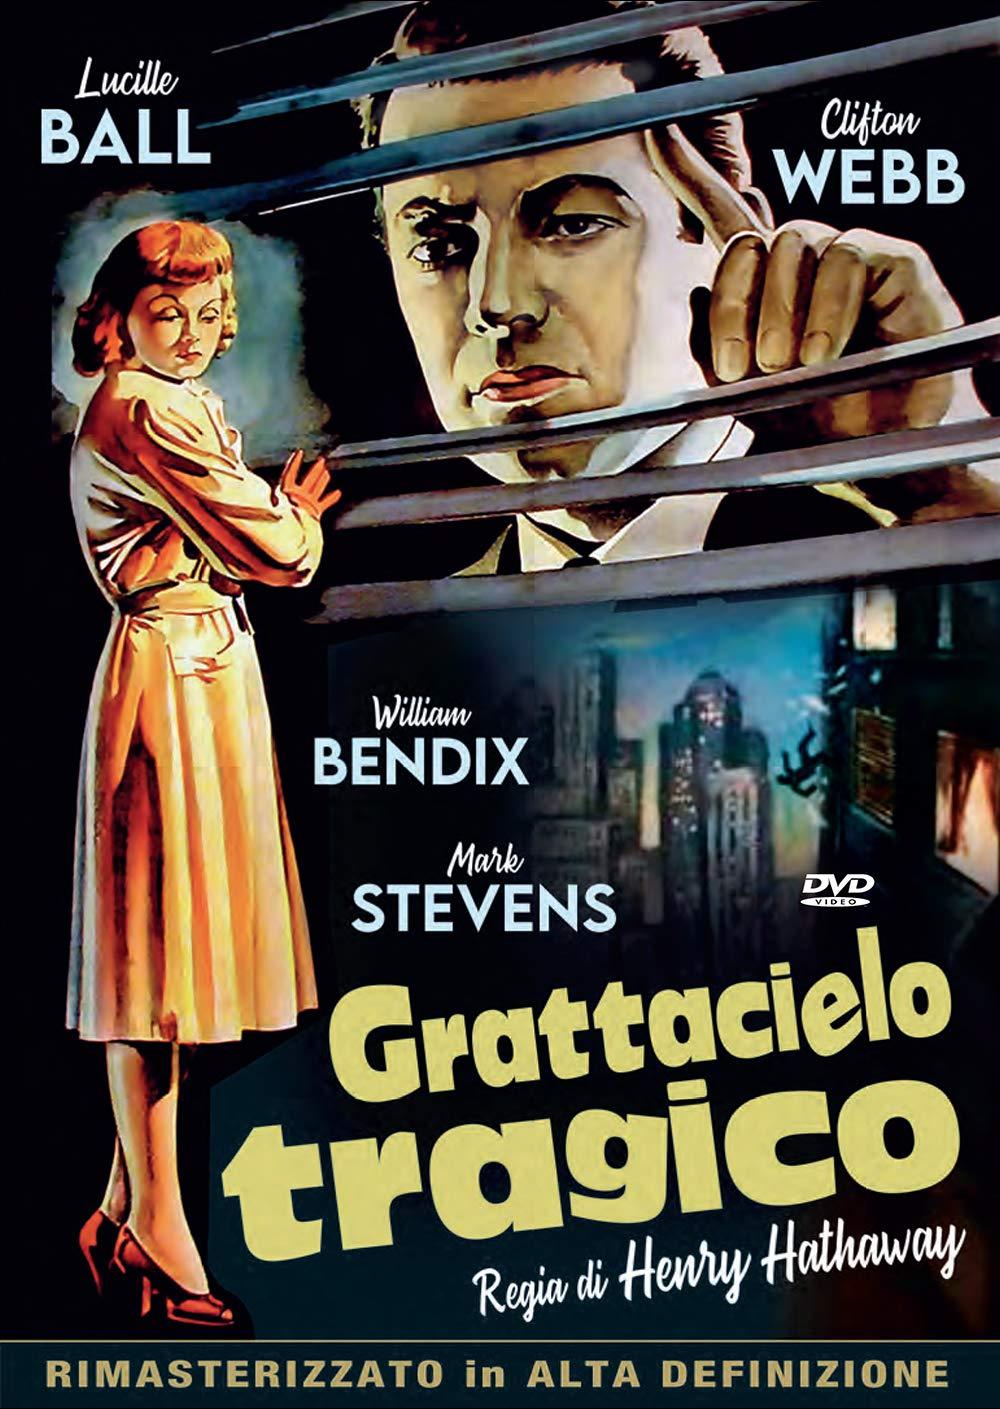 GRATTACIELO TRAGICO (DVD)